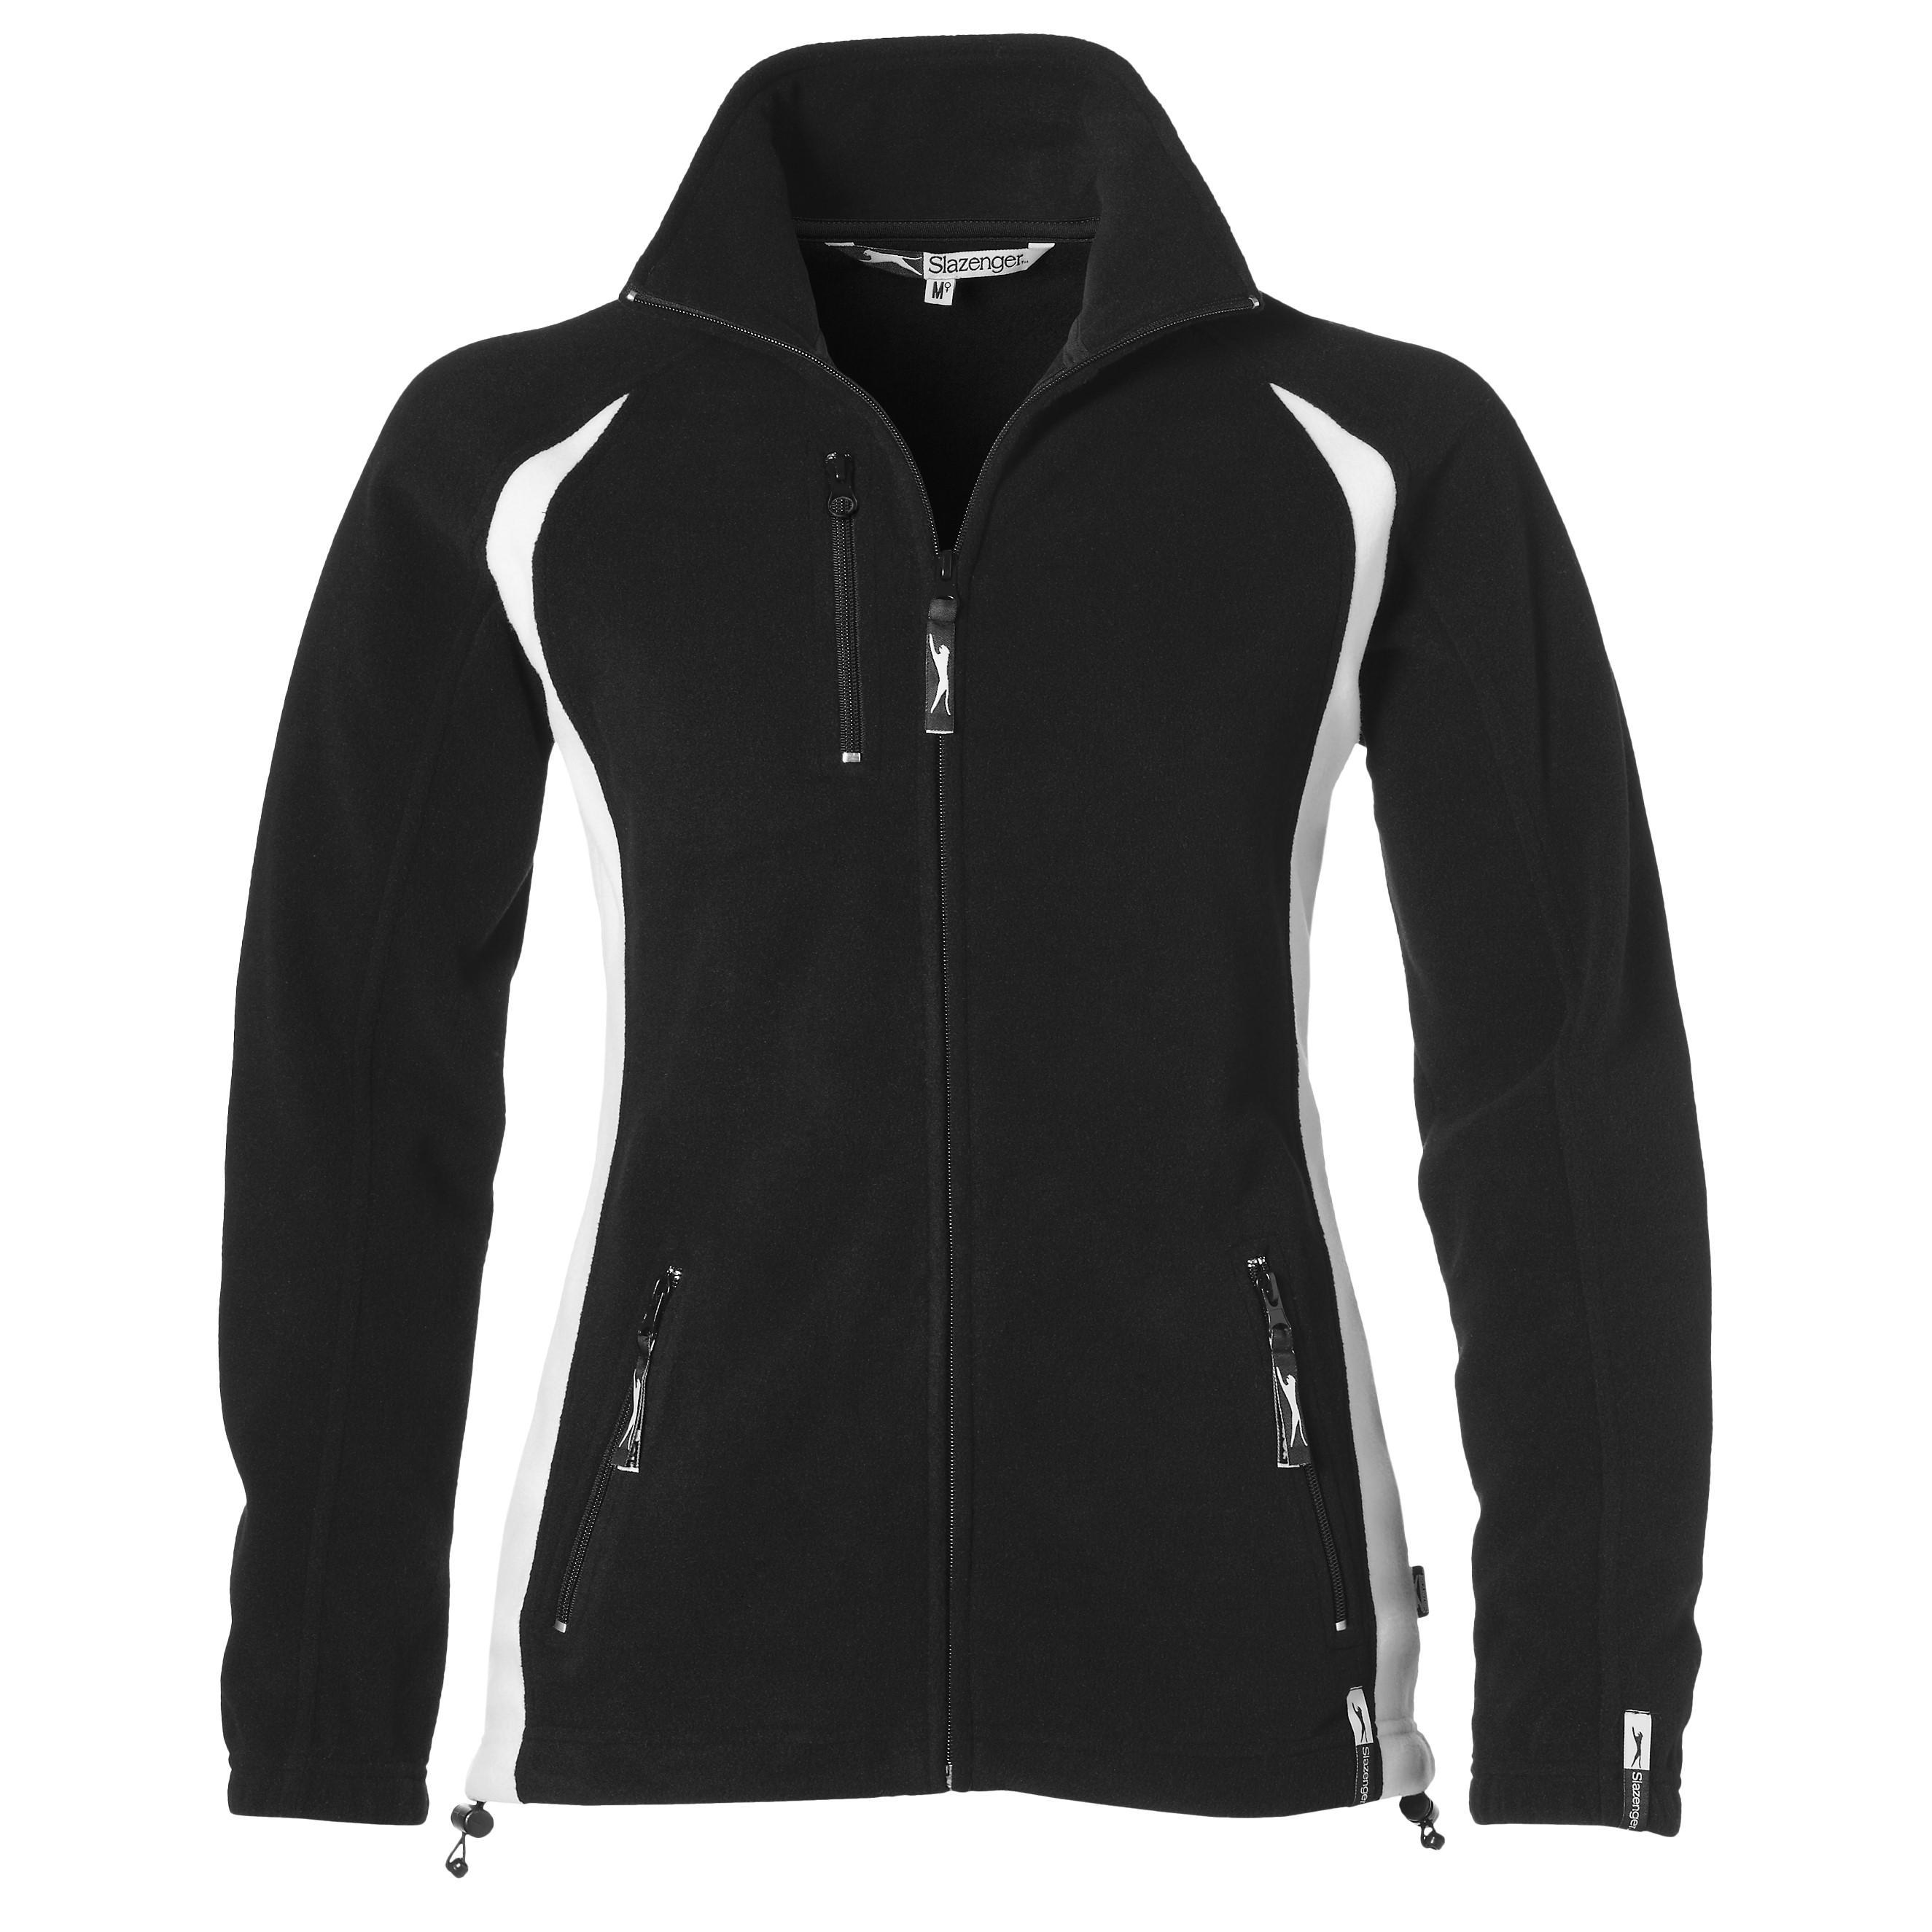 Ladies Apex Micro Fleece Jacket - Black Only